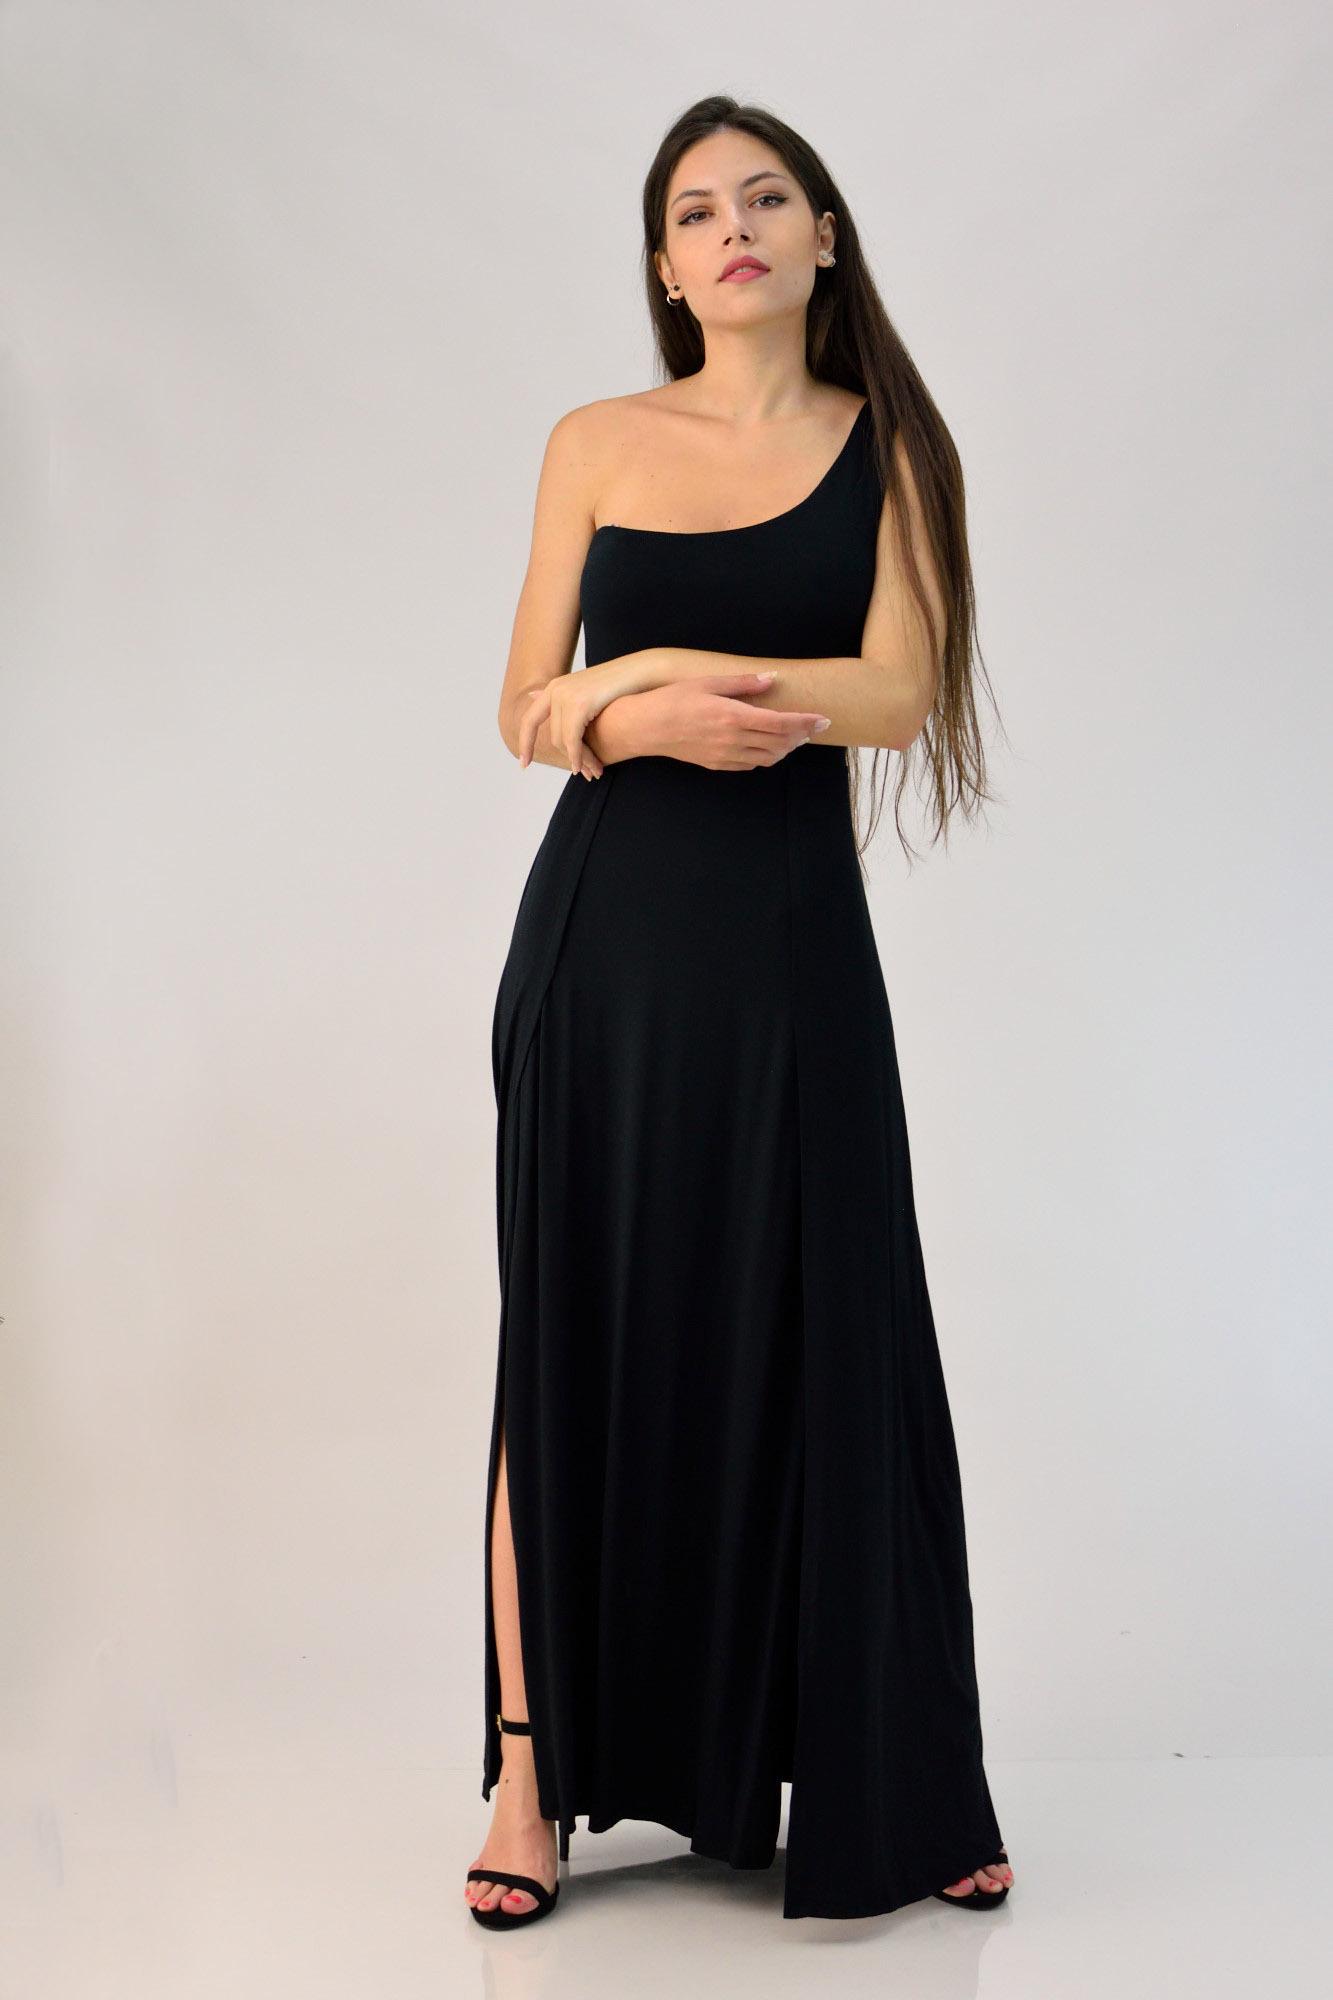 0765cca91b47 Φόρεμα μάξι με έναν ώμο. Tap to expand